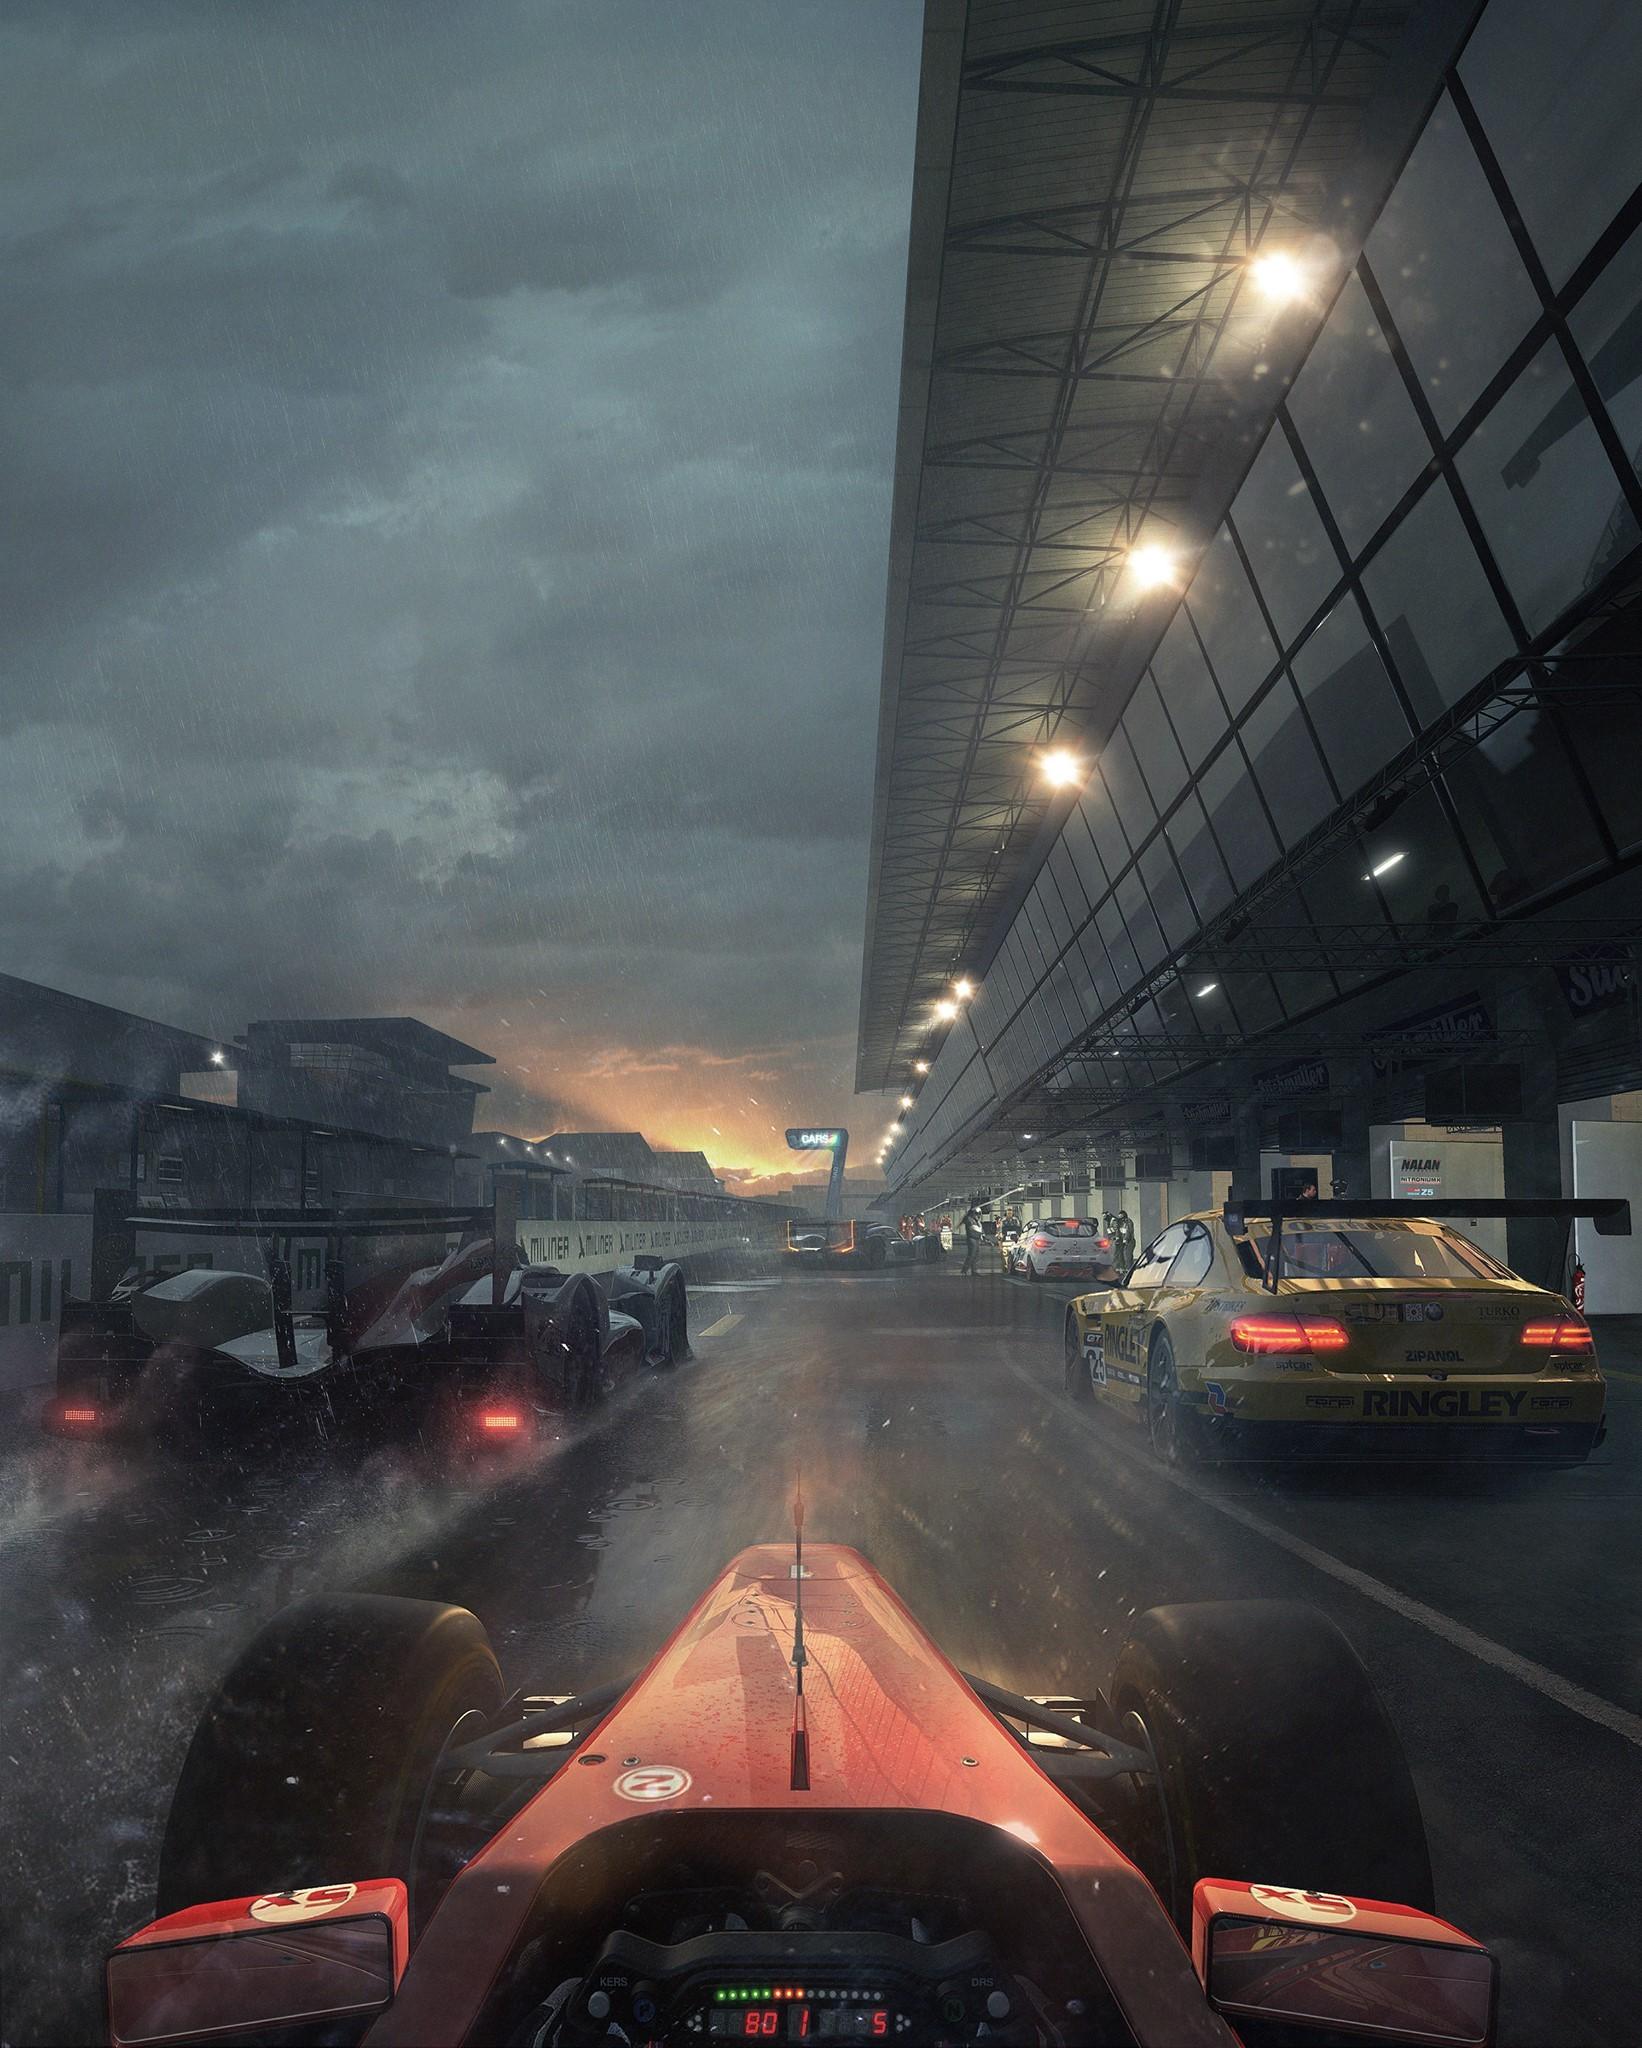 Wallpaper : video games, night, vehicle, artwork, evening